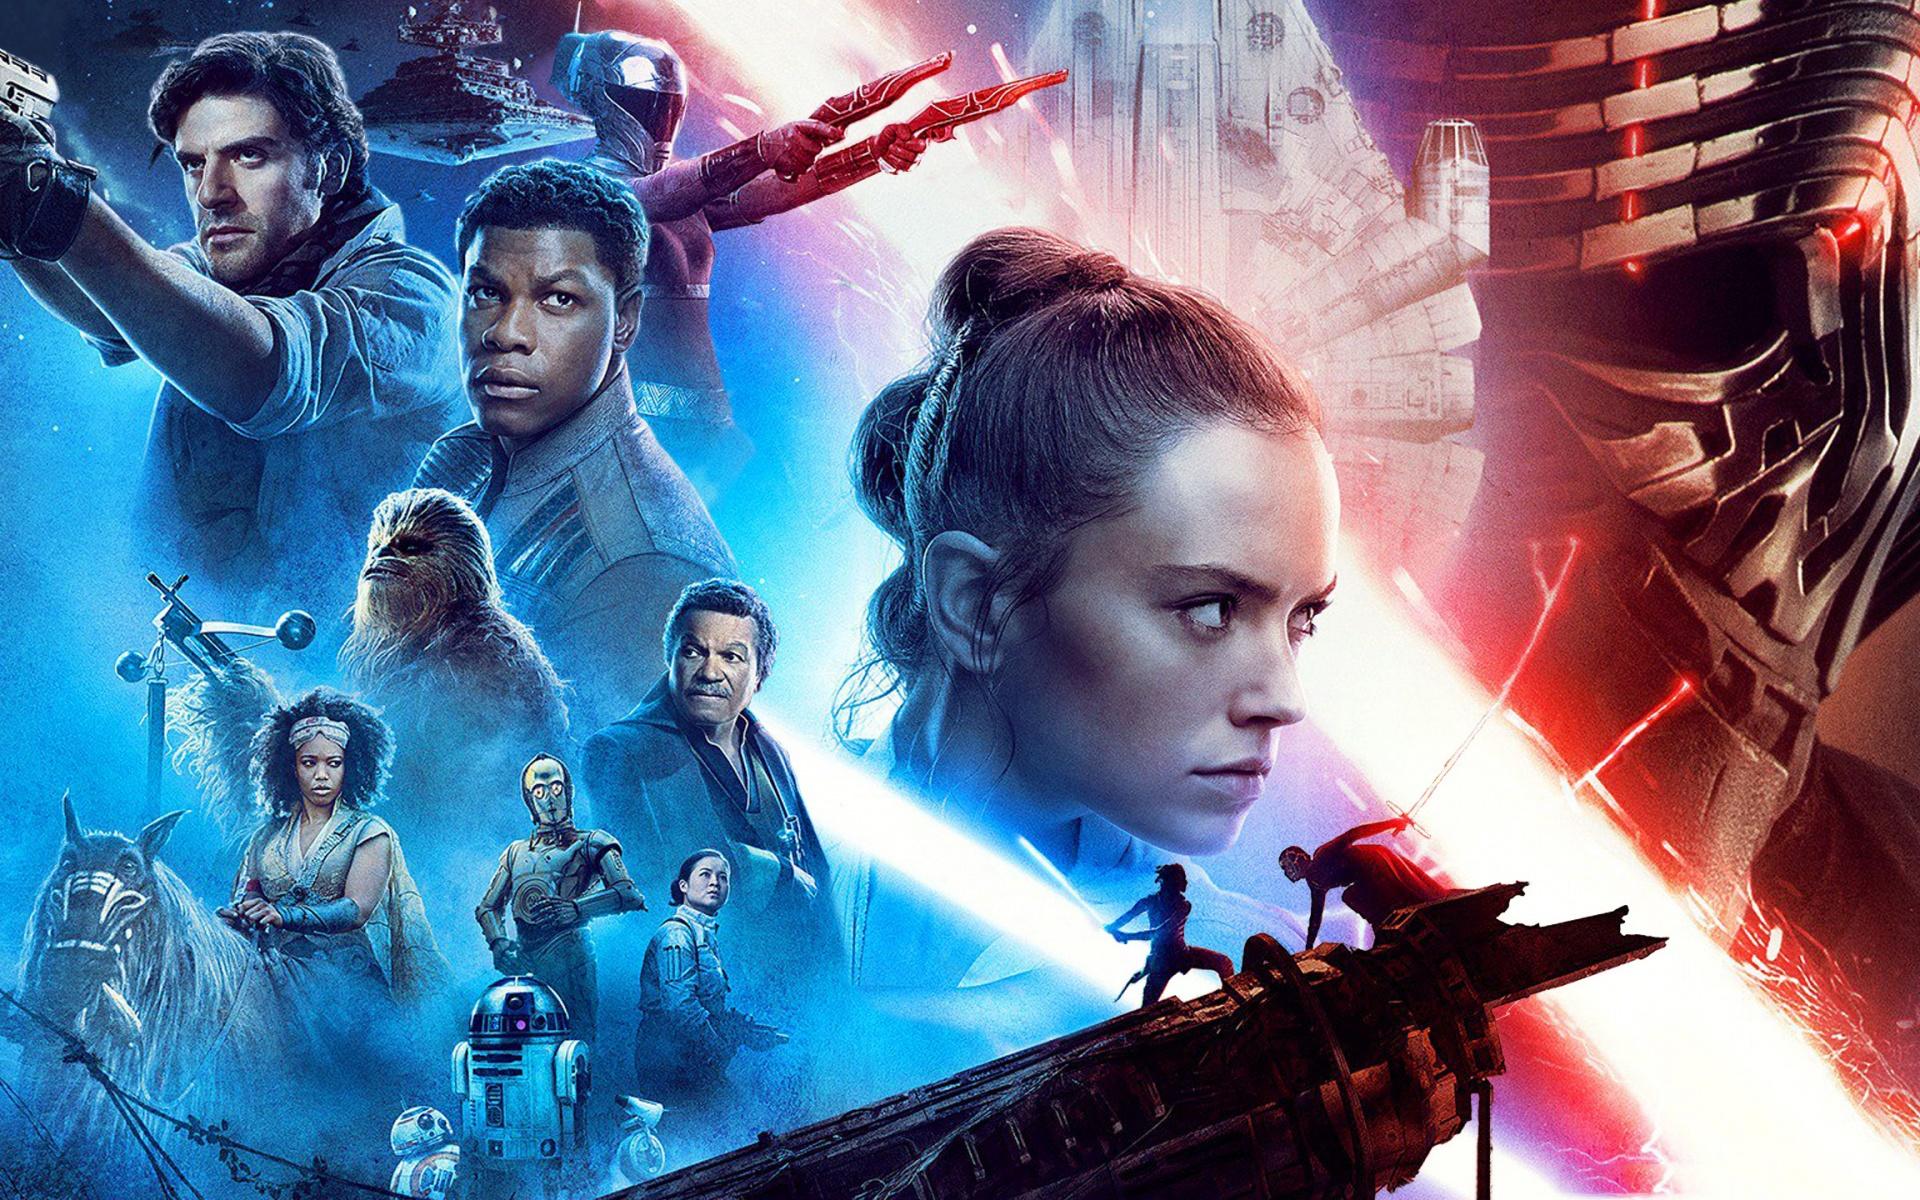 Movie Star Wars The Rise Of Skywalker Star Wars R2 Star Wars The Rise Of Skywalker Poster 1920x1200 Download Hd Wallpaper Wallpapertip